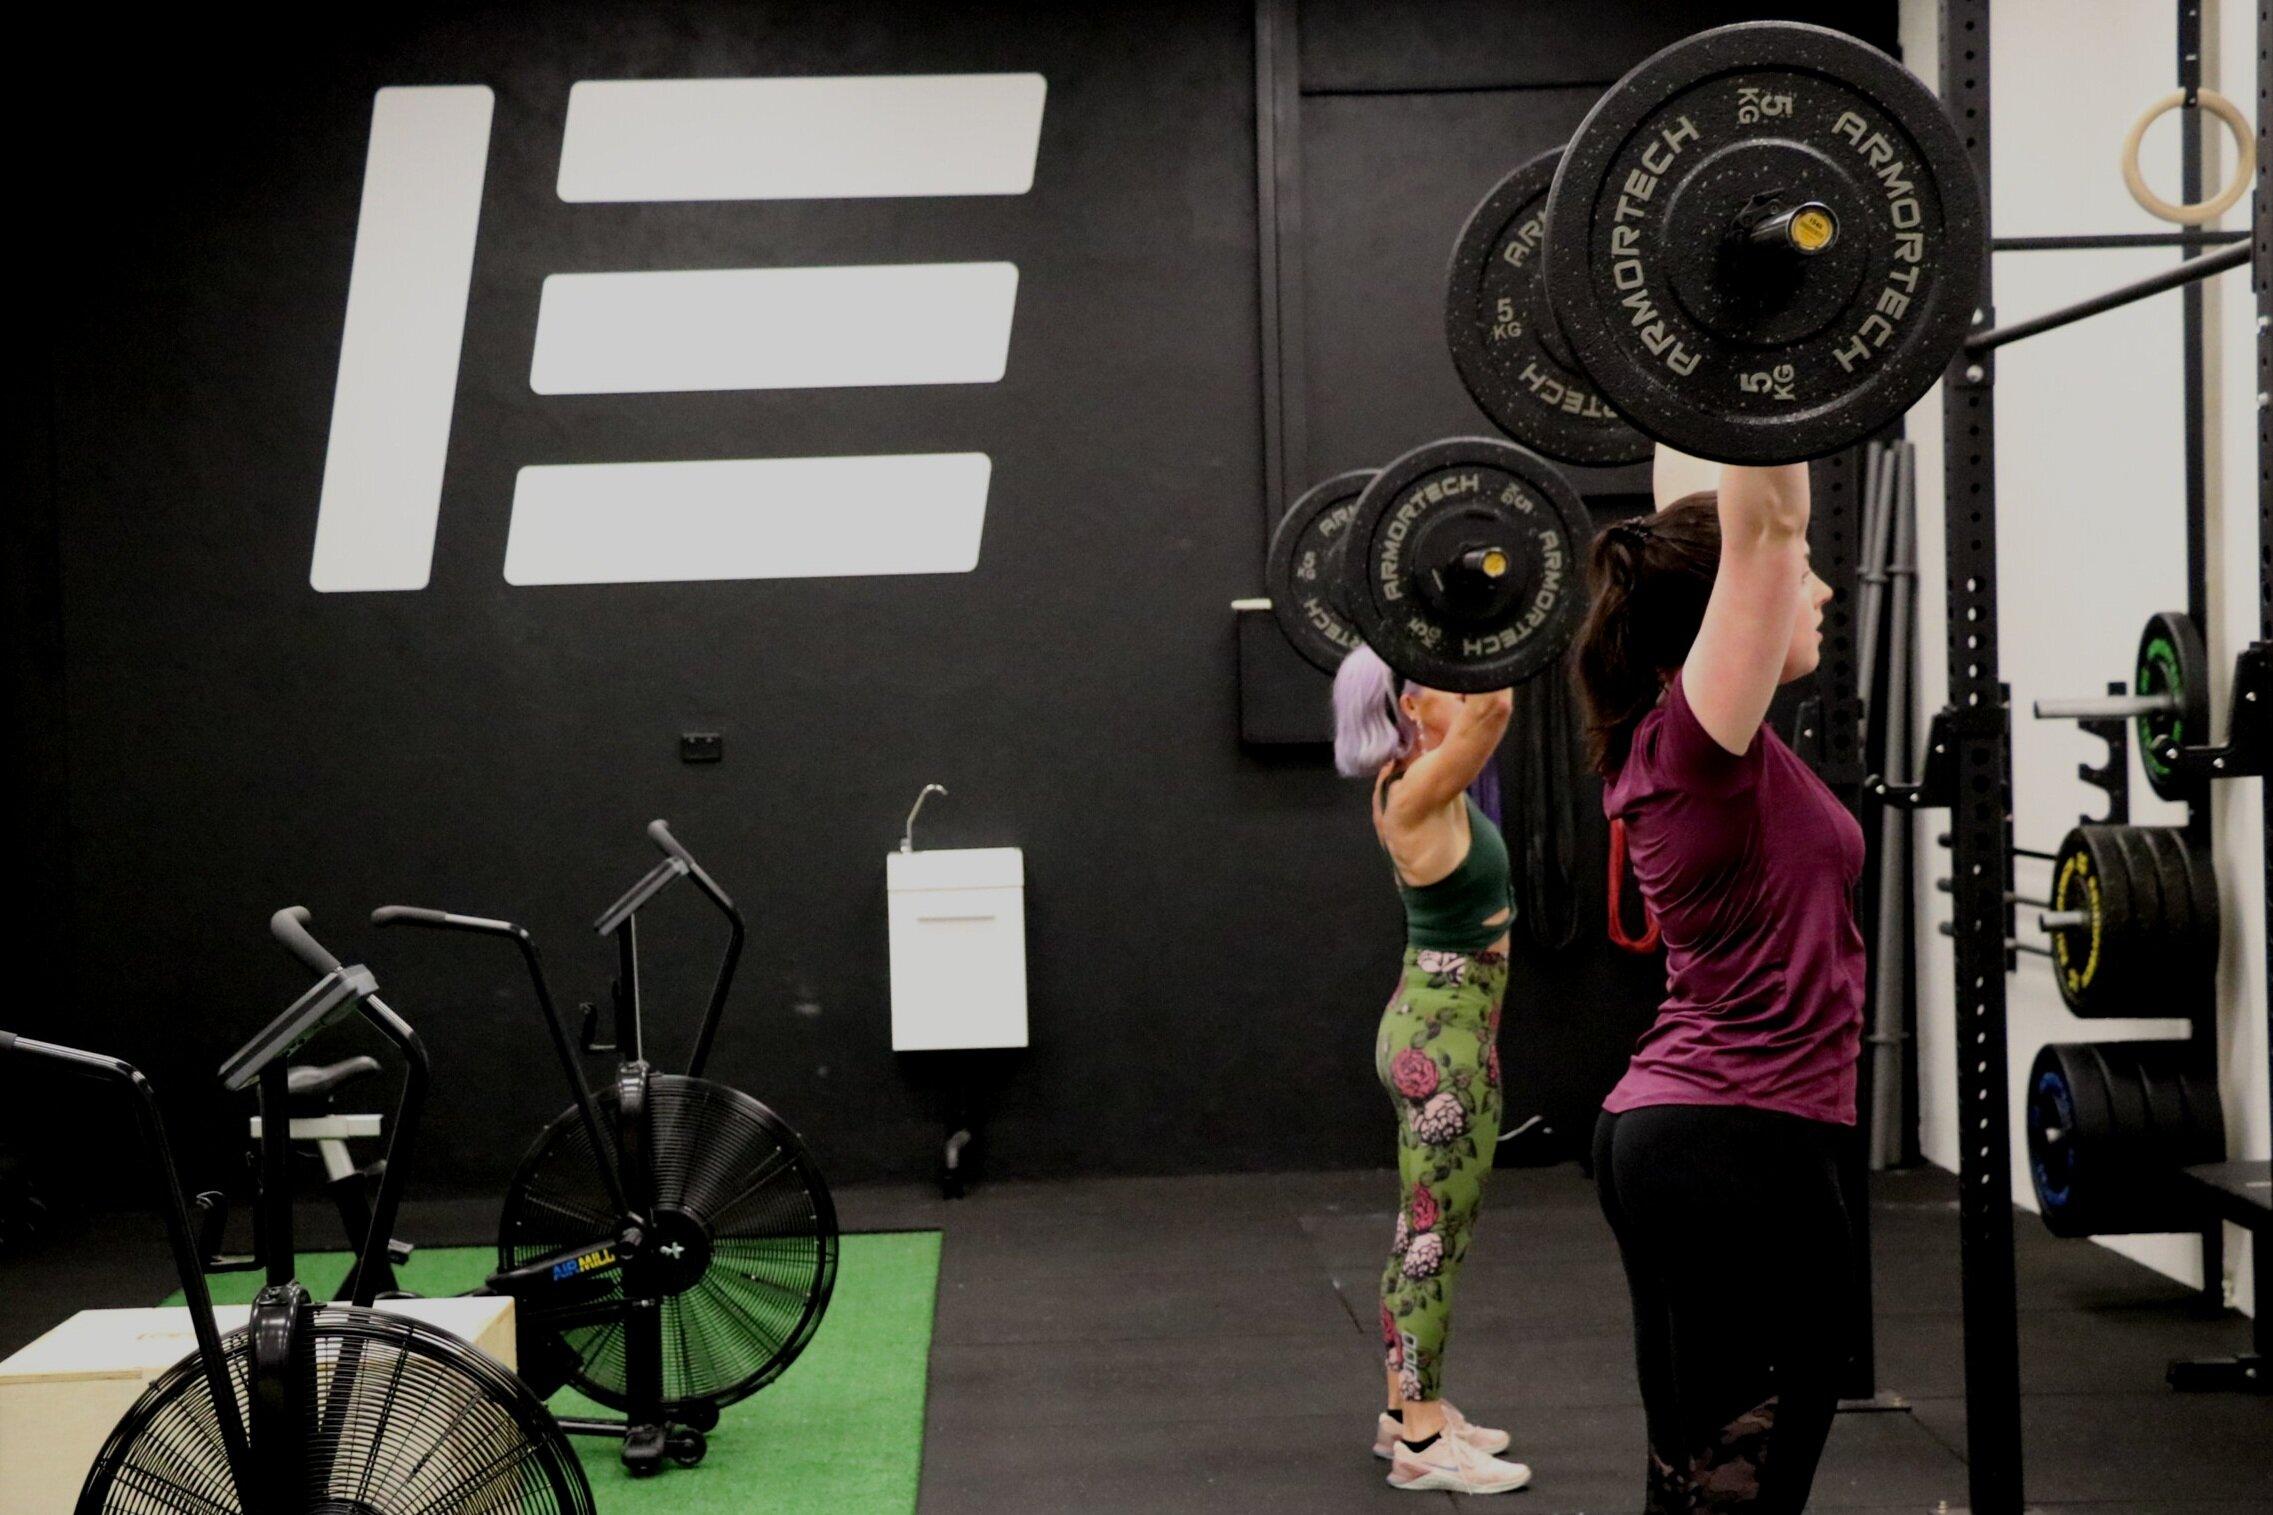 bsline - _Fitness Testing